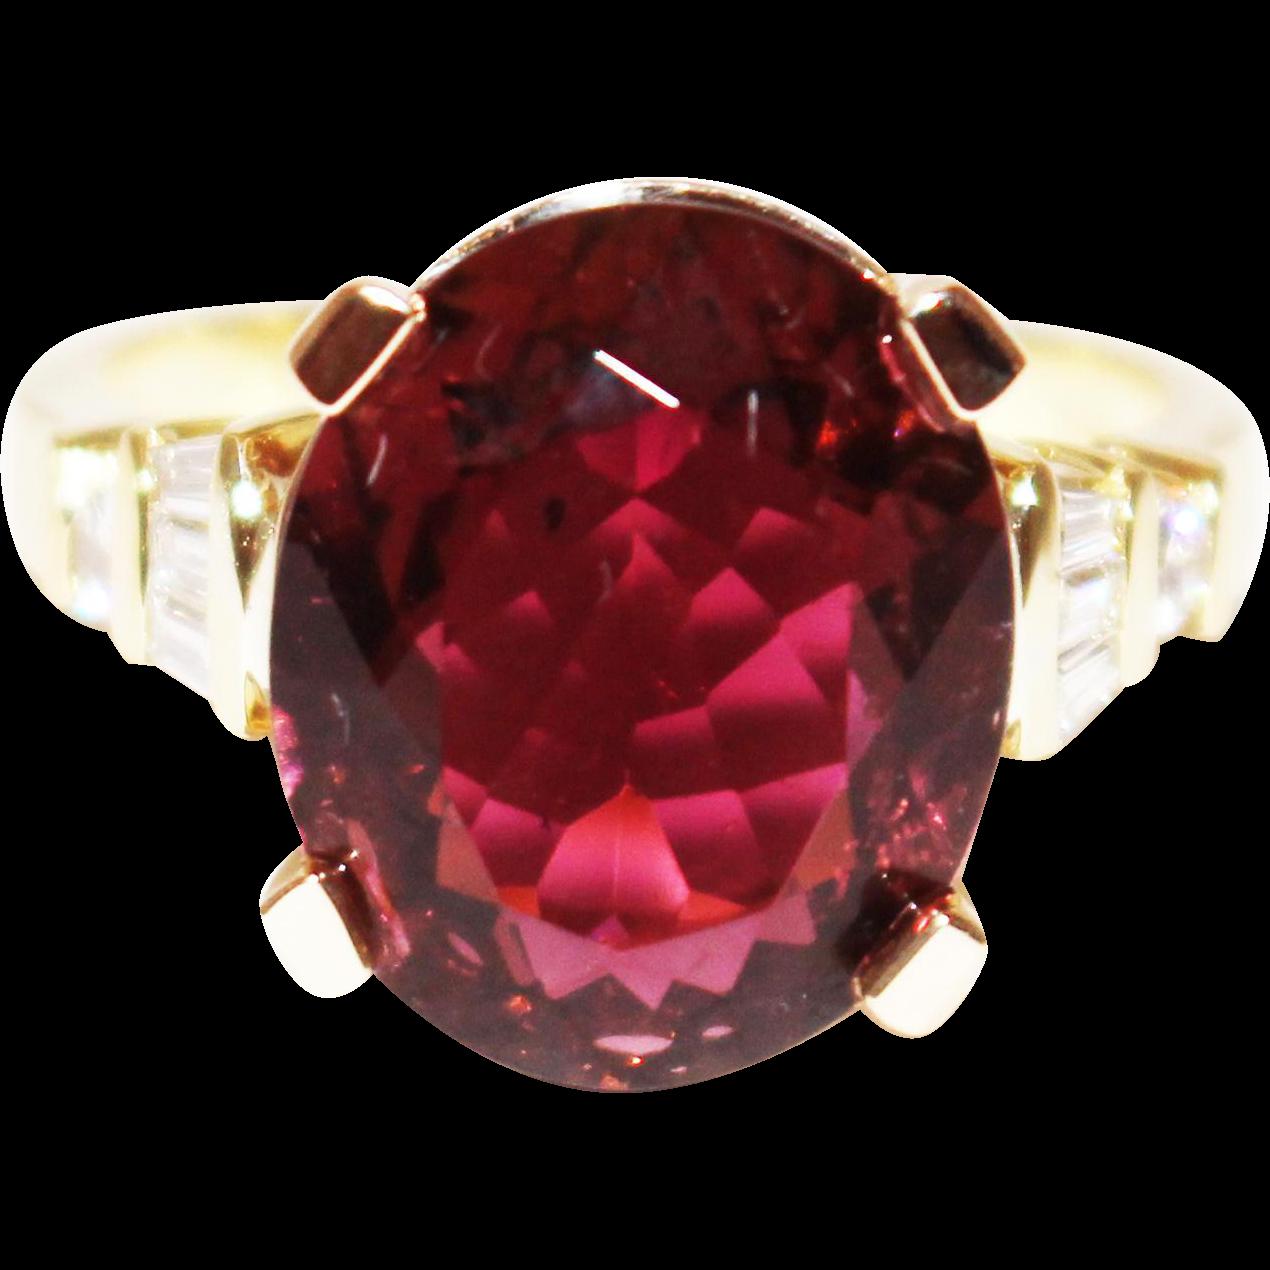 9 CT Natural Raspberry Pink Red Rubellite Tourmaline